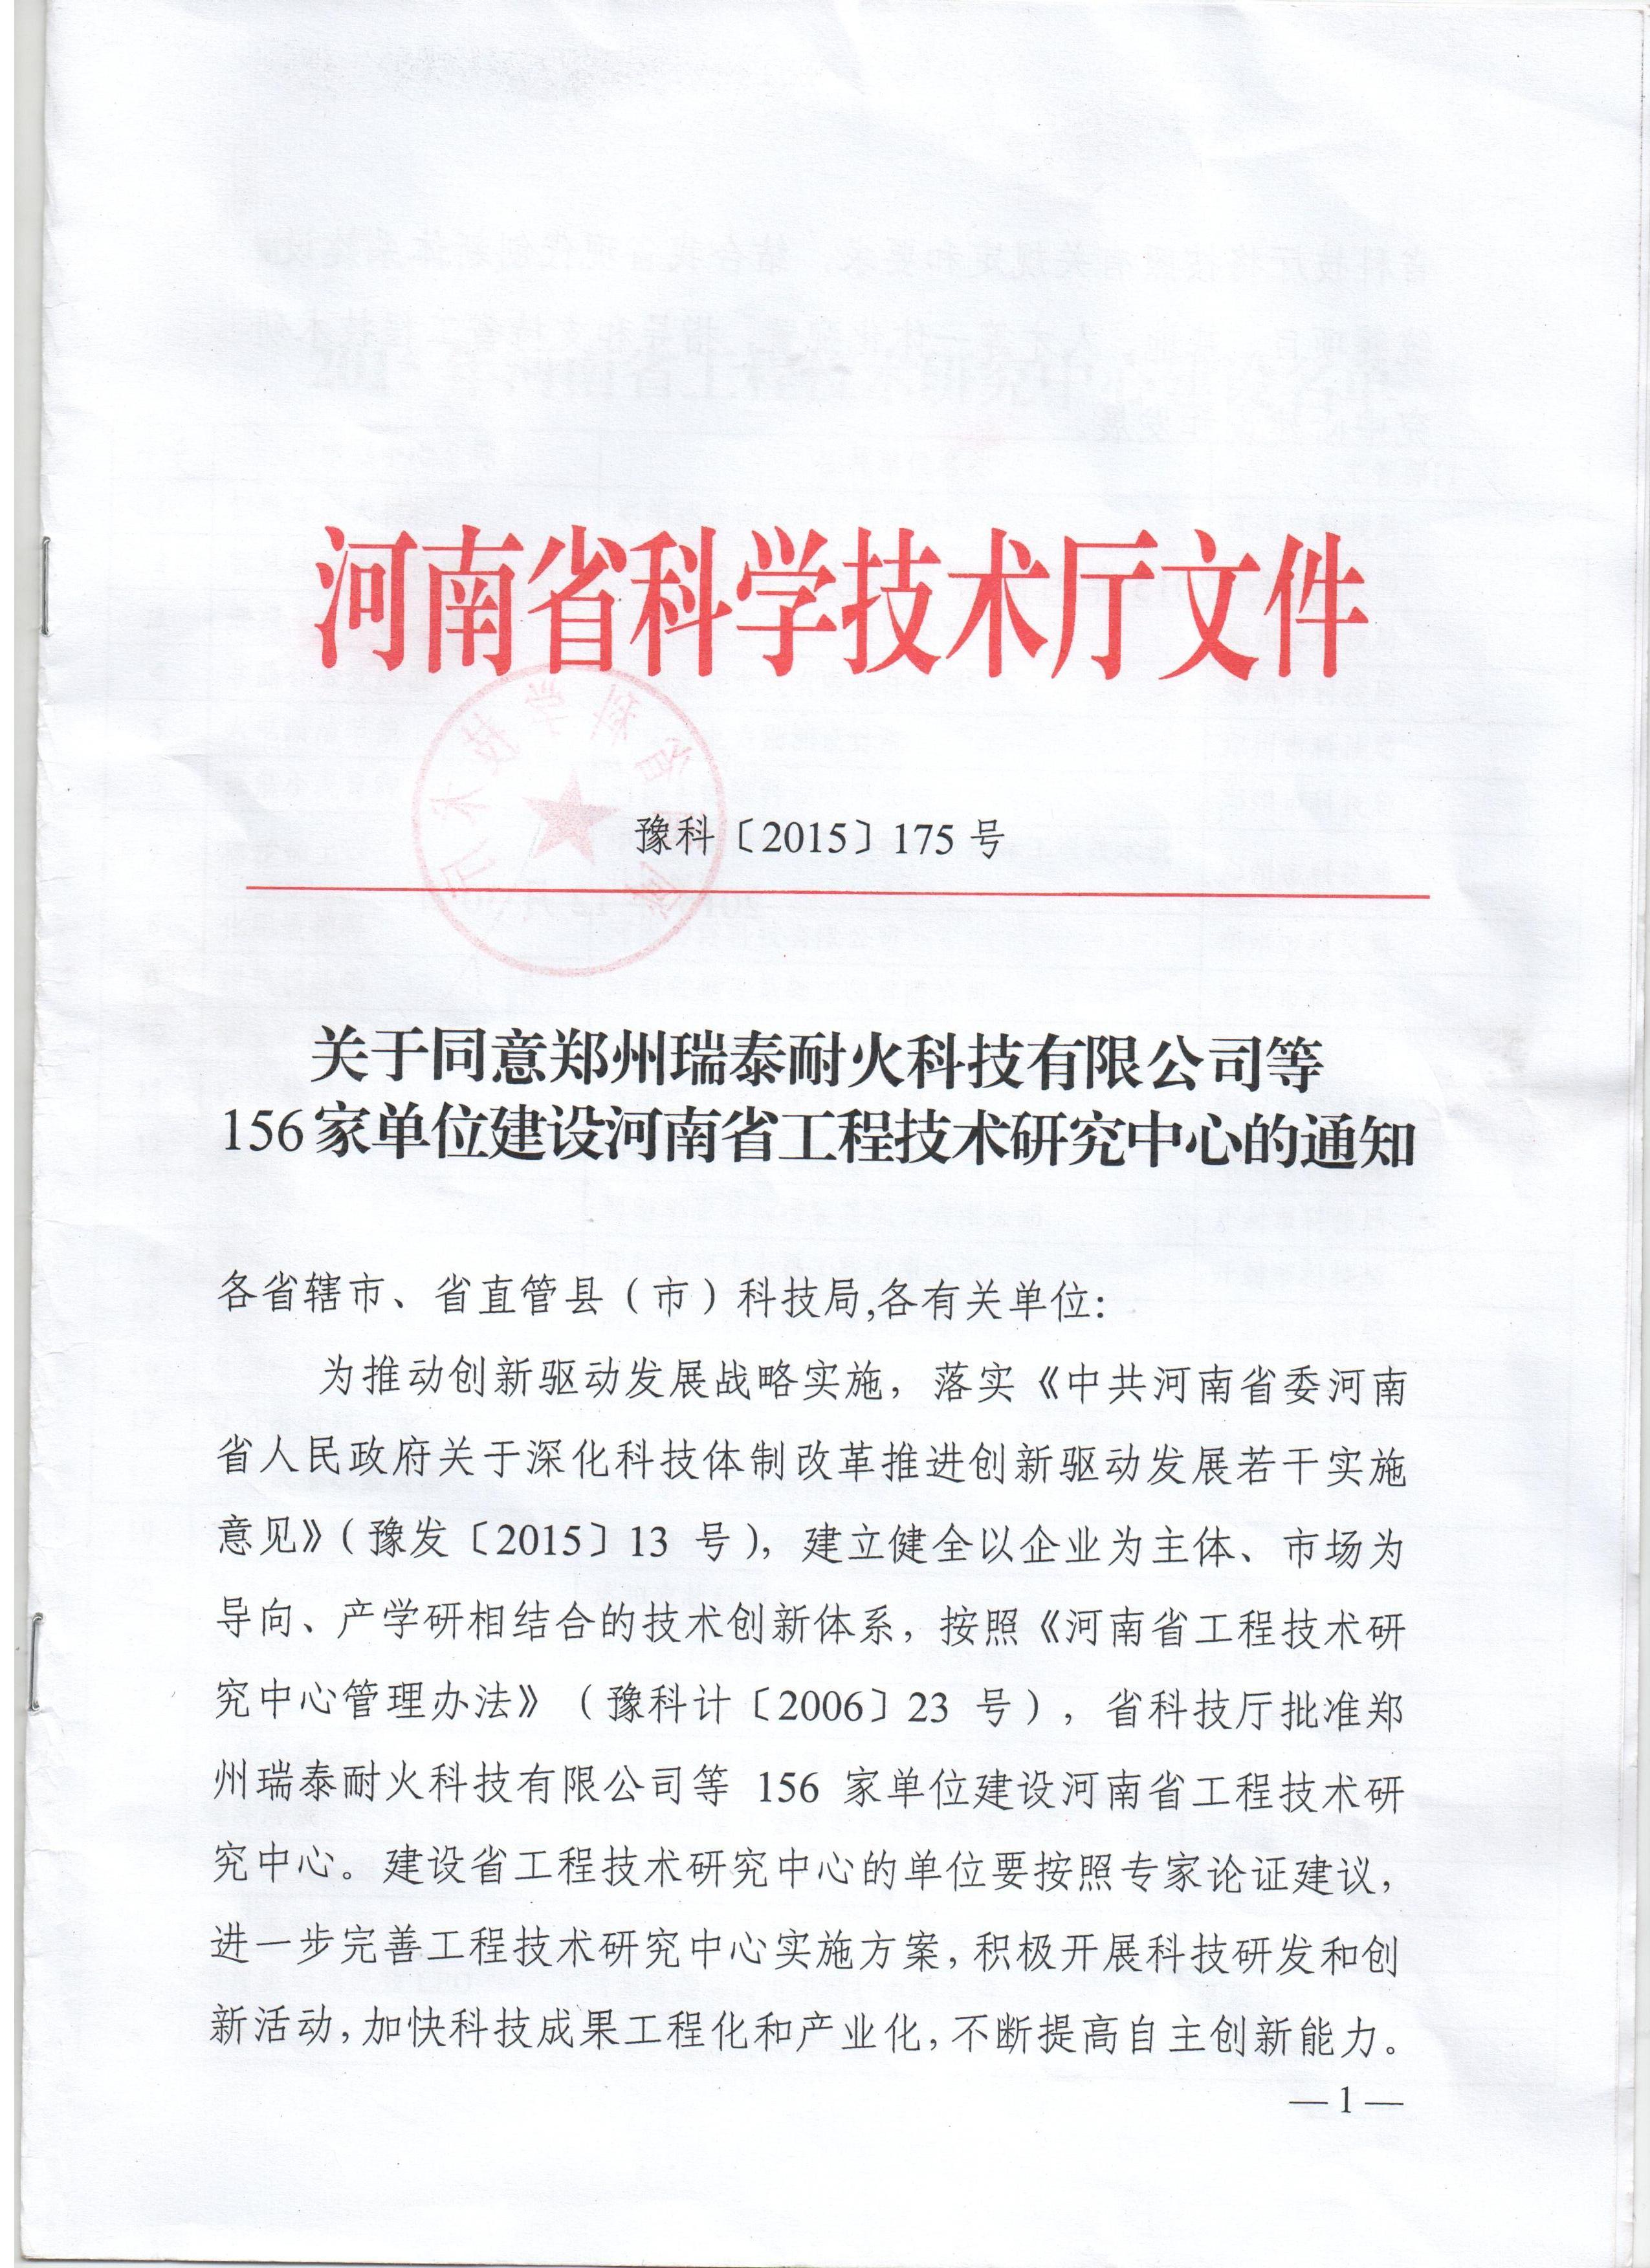 http://cdn.ilhjy.cn/165738691_shop_ilhjy_cn/public_html/runtime/uploads/5d4f927e67cea1fc390723f4f1e5e49d.jpg